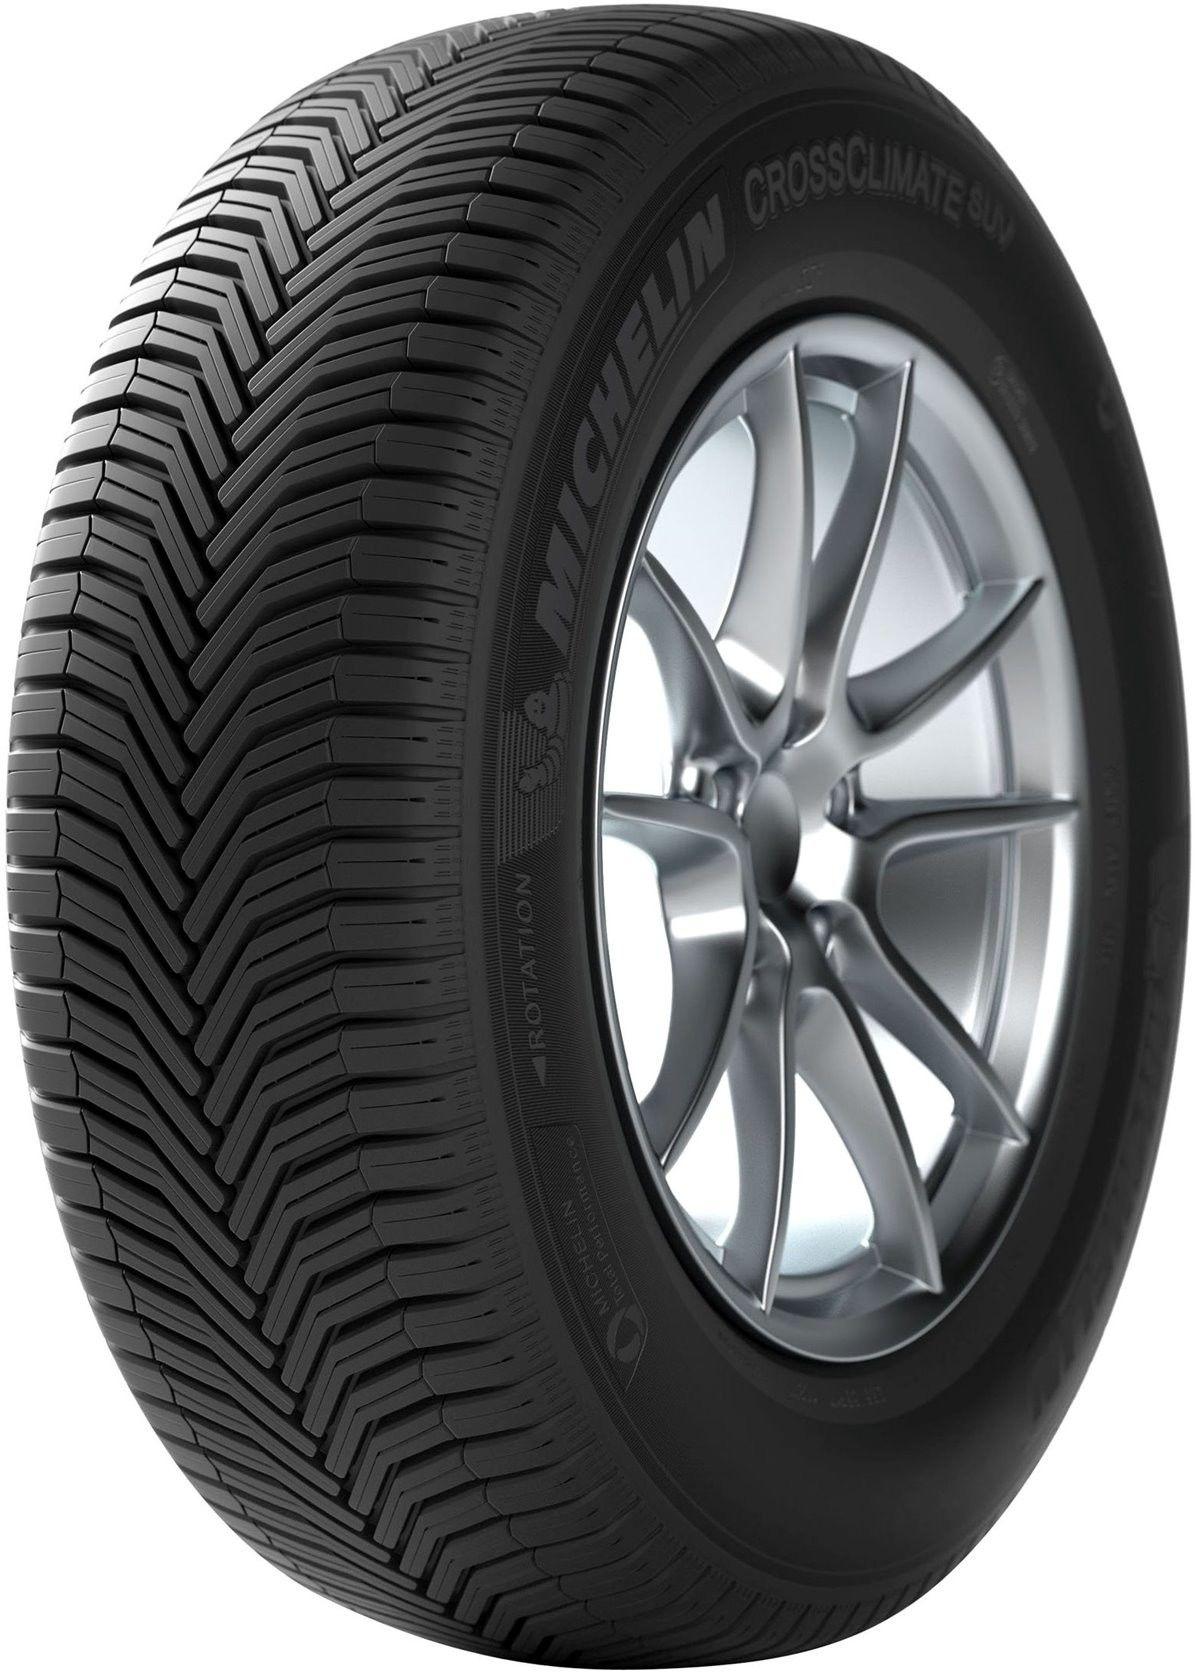 Michelin CROSSCLIMATE 235/50 R18 101 V